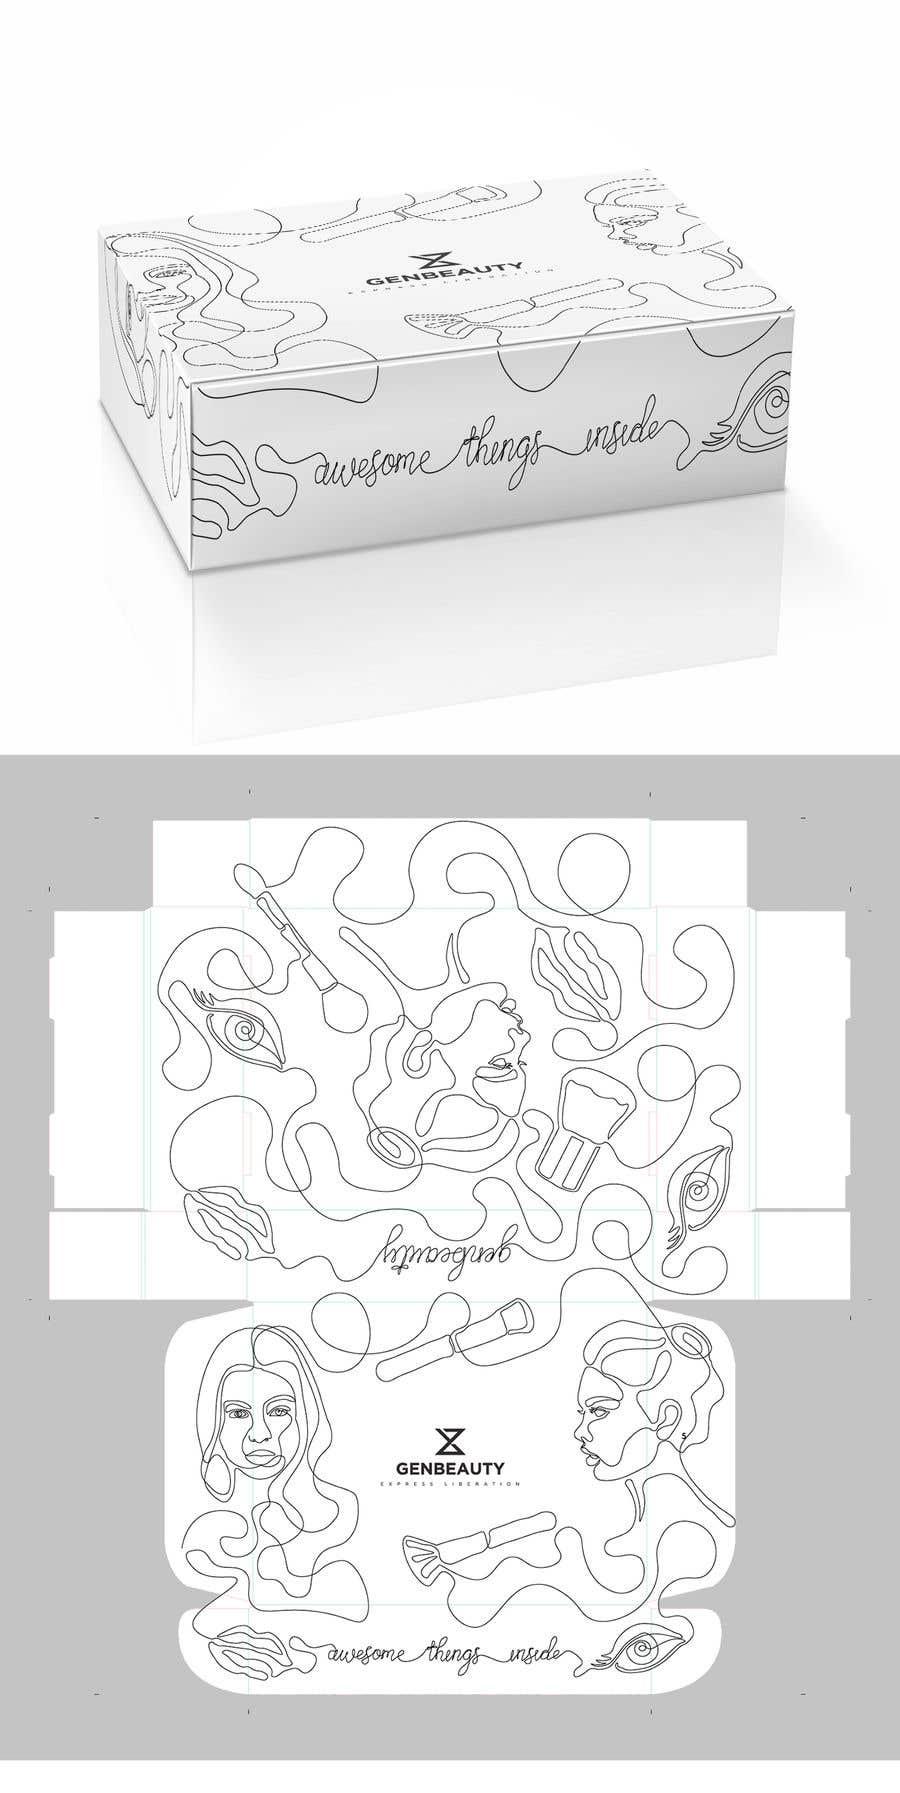 Kilpailutyö #17 kilpailussa One line art packaging design